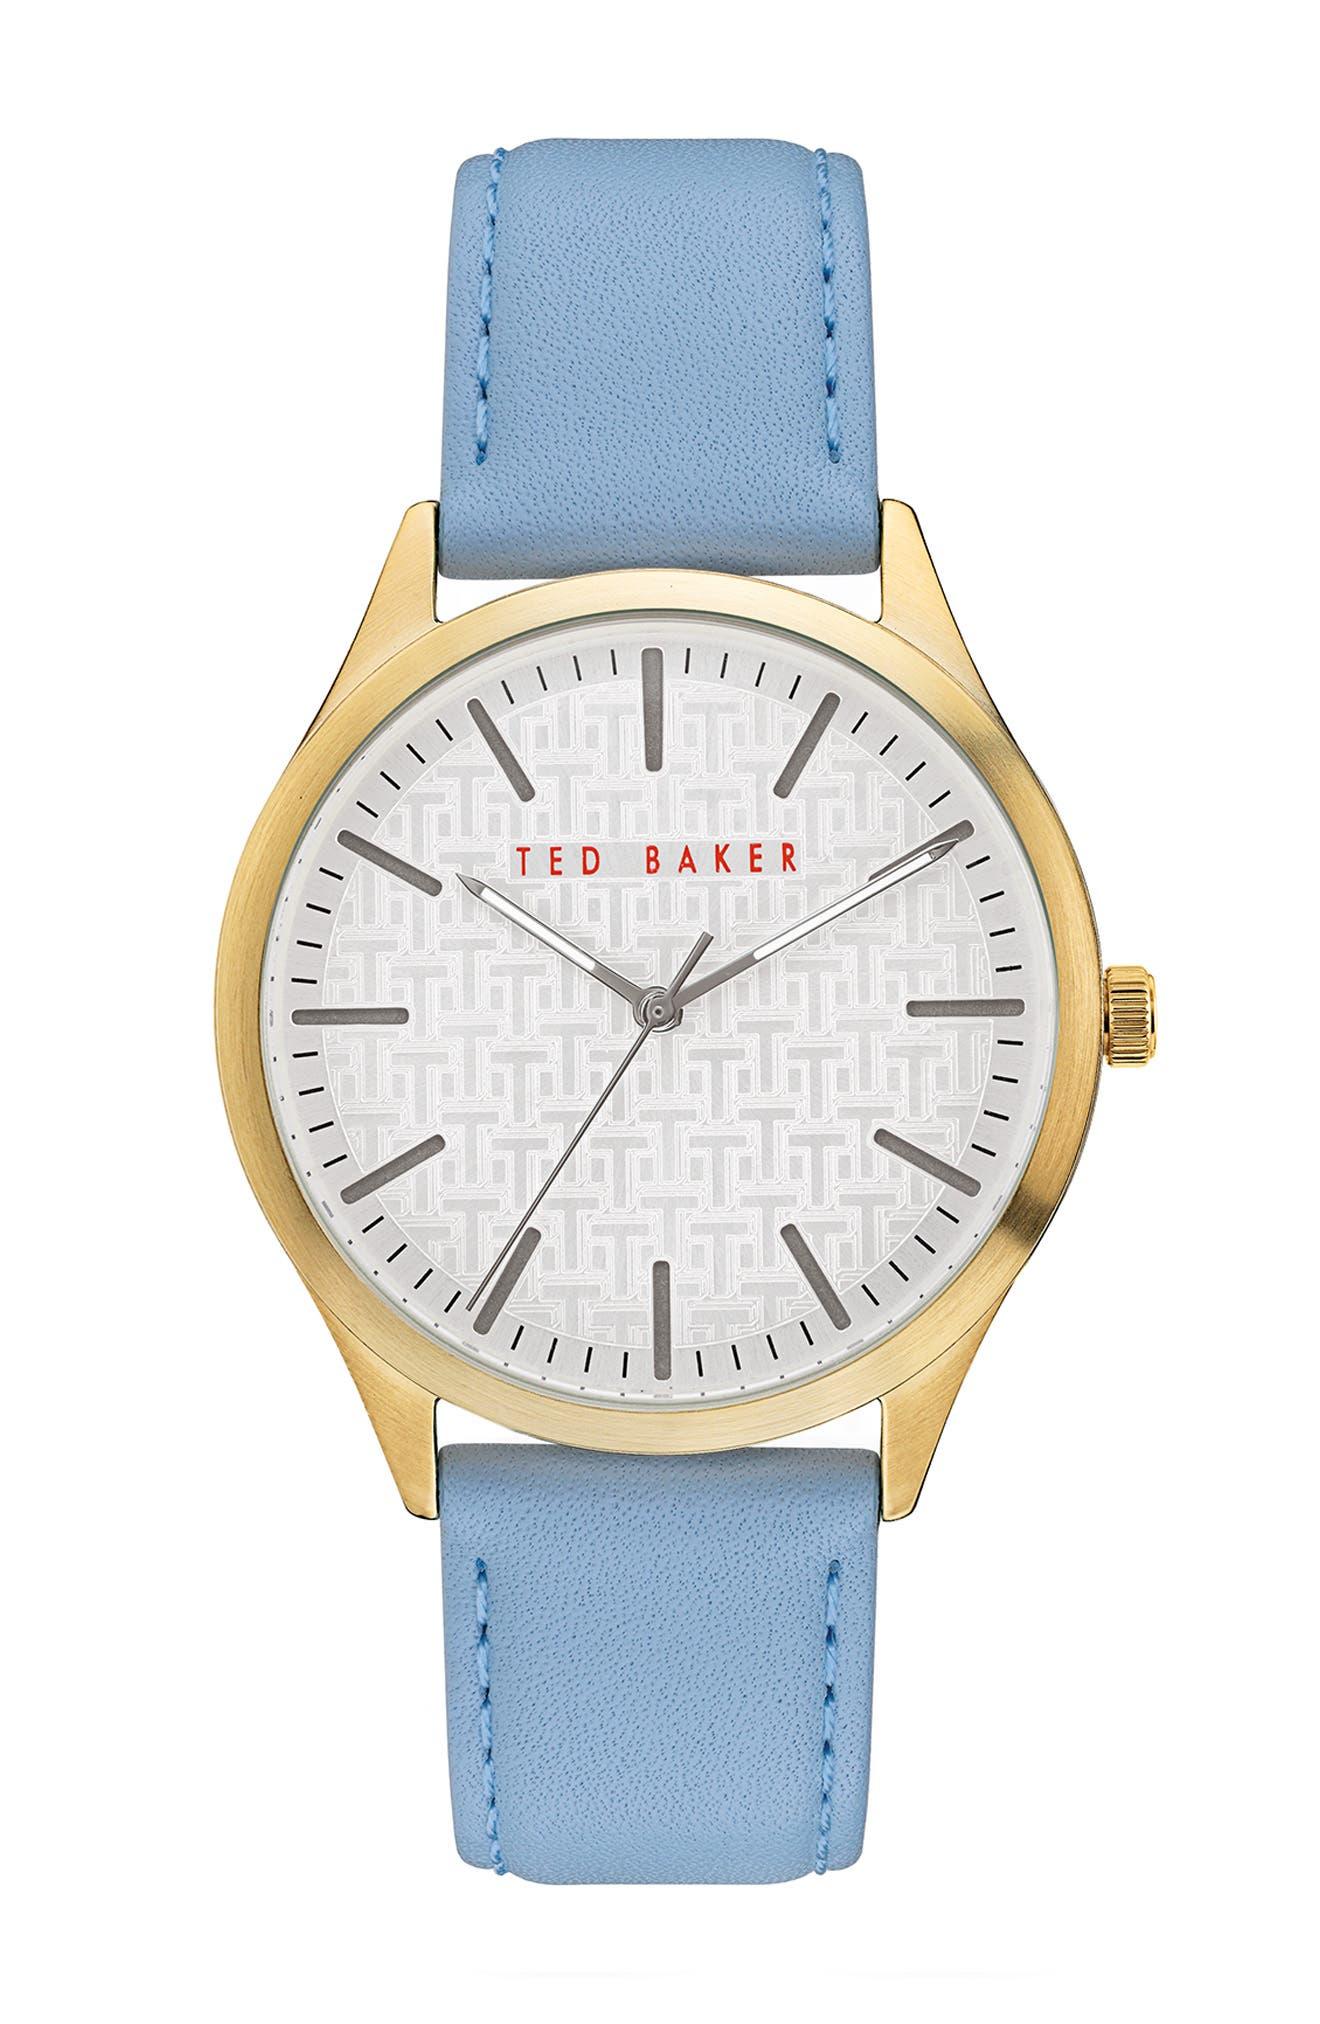 Image of Ted Baker London Men's Manhatt Leather Strap Watch, 40mm